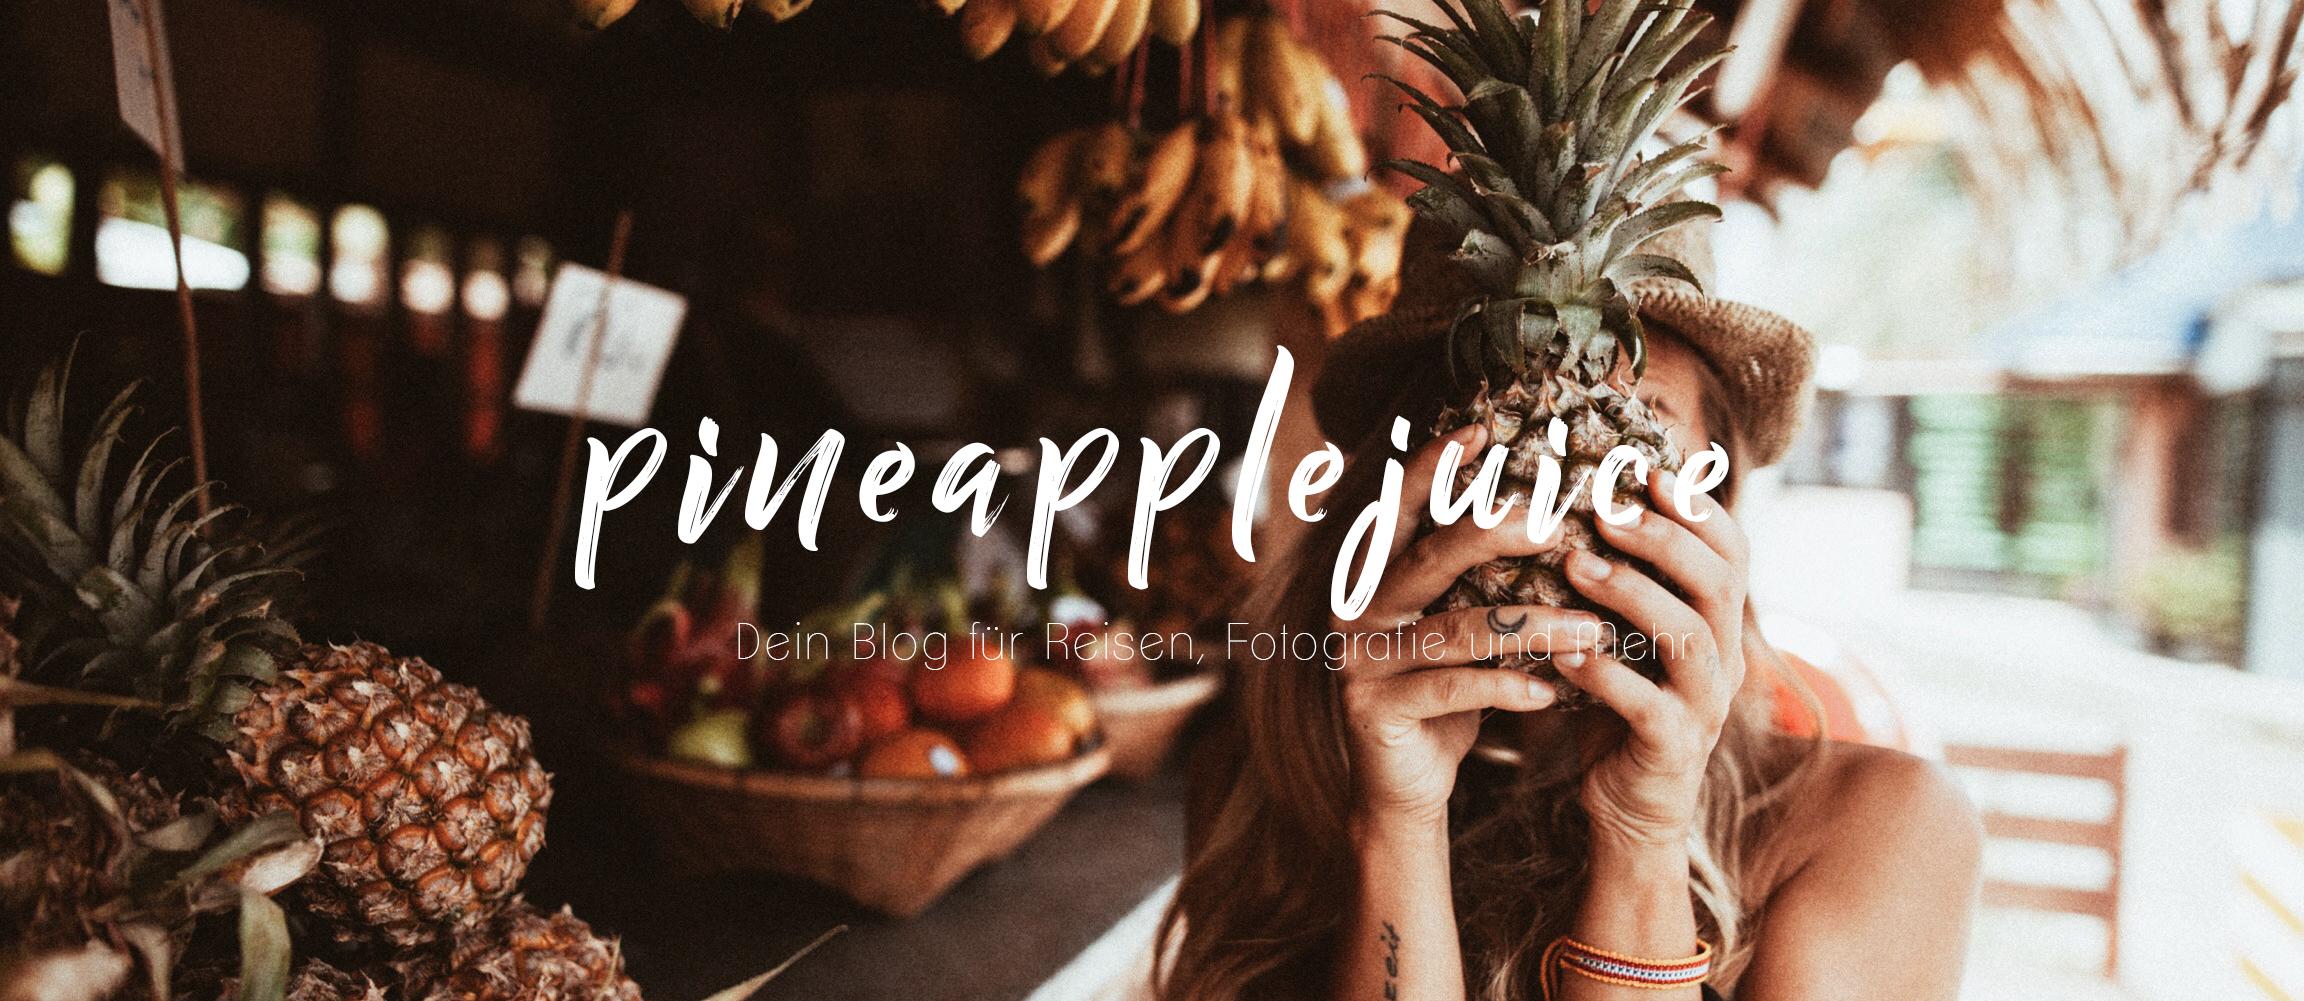 pineapplejuice